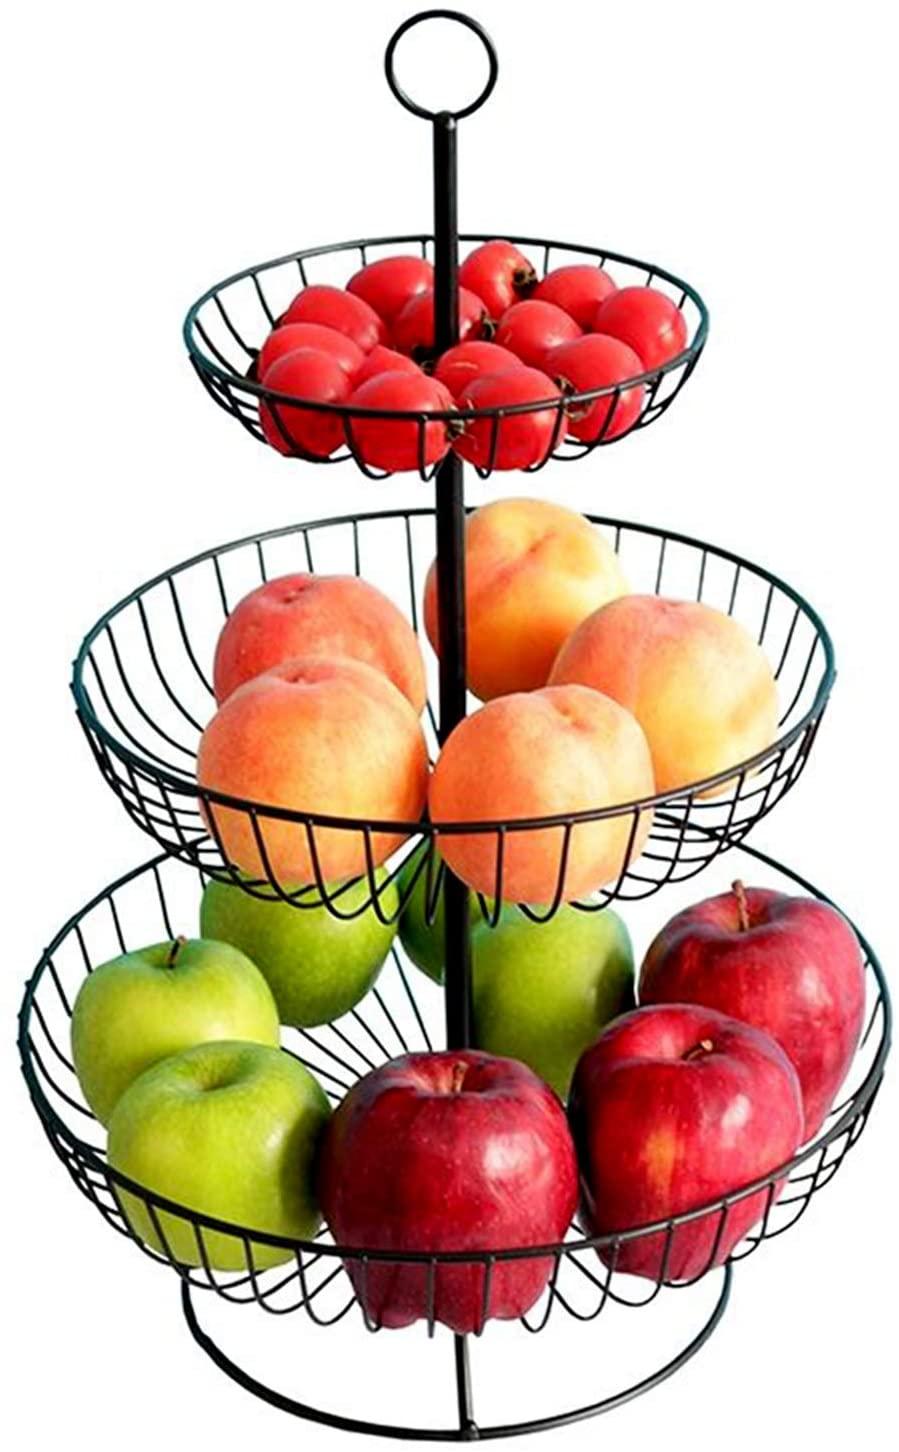 3 Tier Metal Fruit Basket Bowl, Jomense Elegant Wire Fruit Rack Tiered Fruit Bowl, Practical Storage Stand for Fruit Cake Snack (Black)